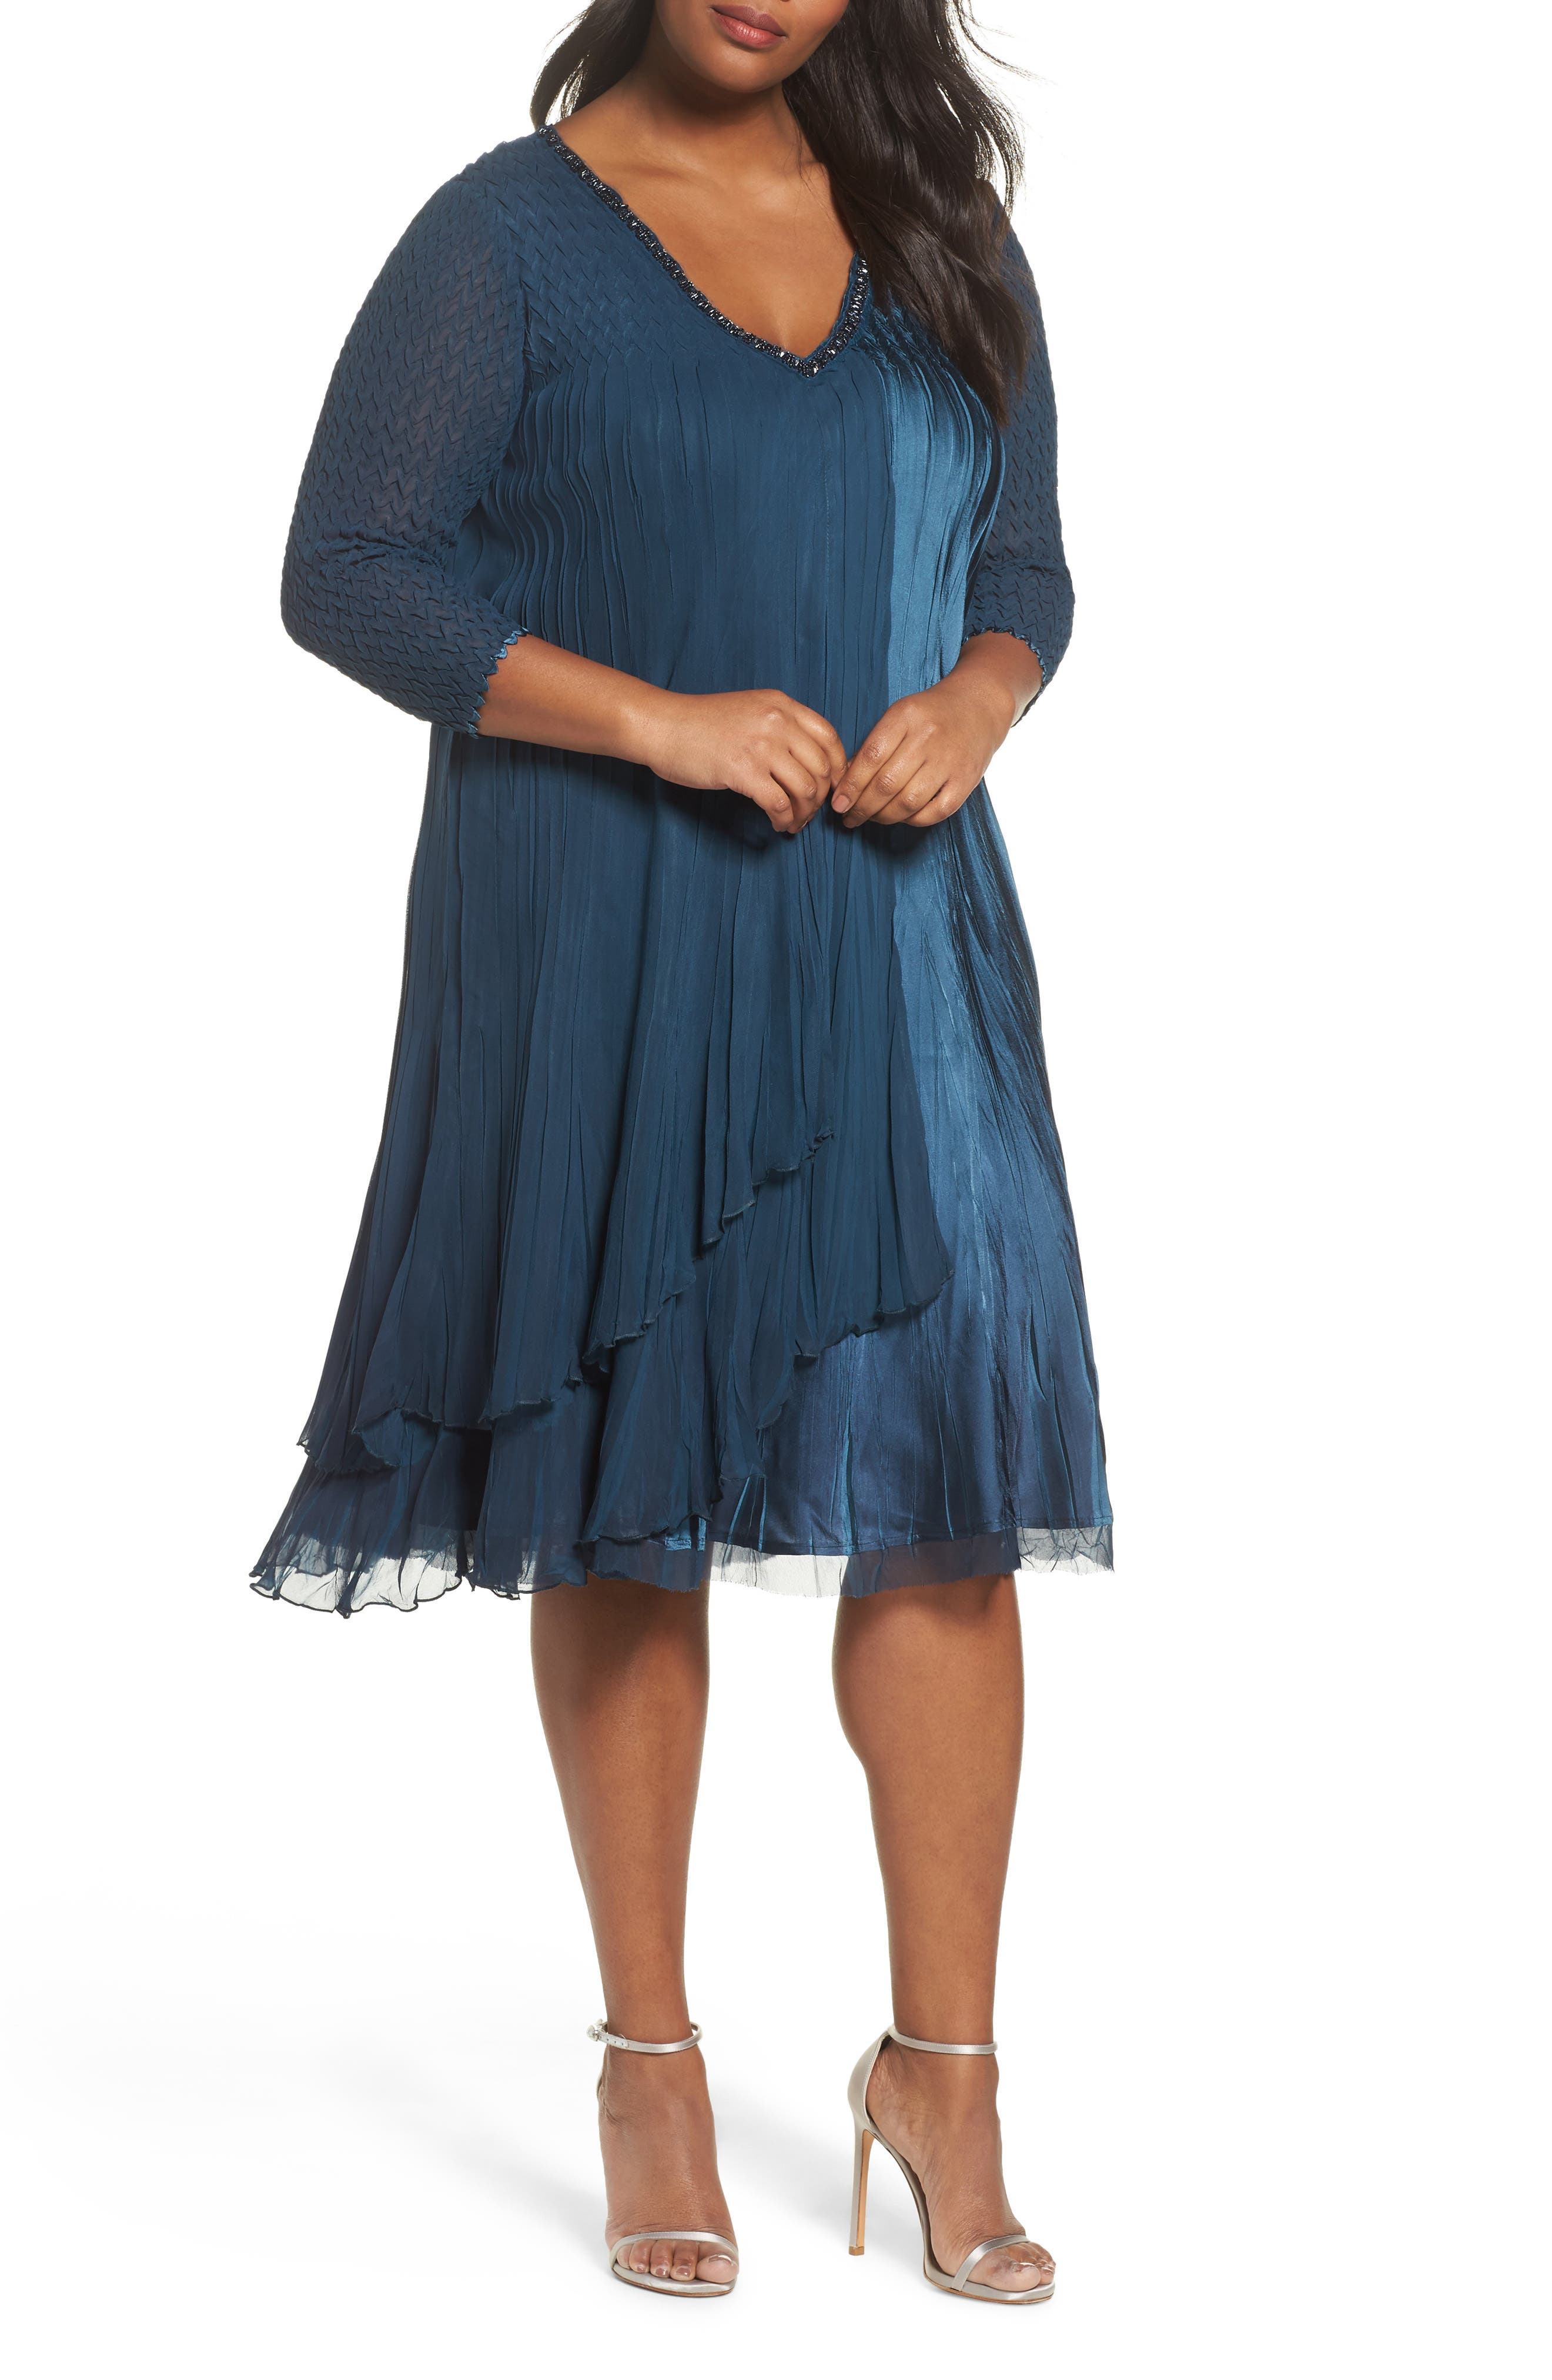 Alternate Image 1 Selected - Komarov Beaded Neck Chiffon Dress (Plus Size)